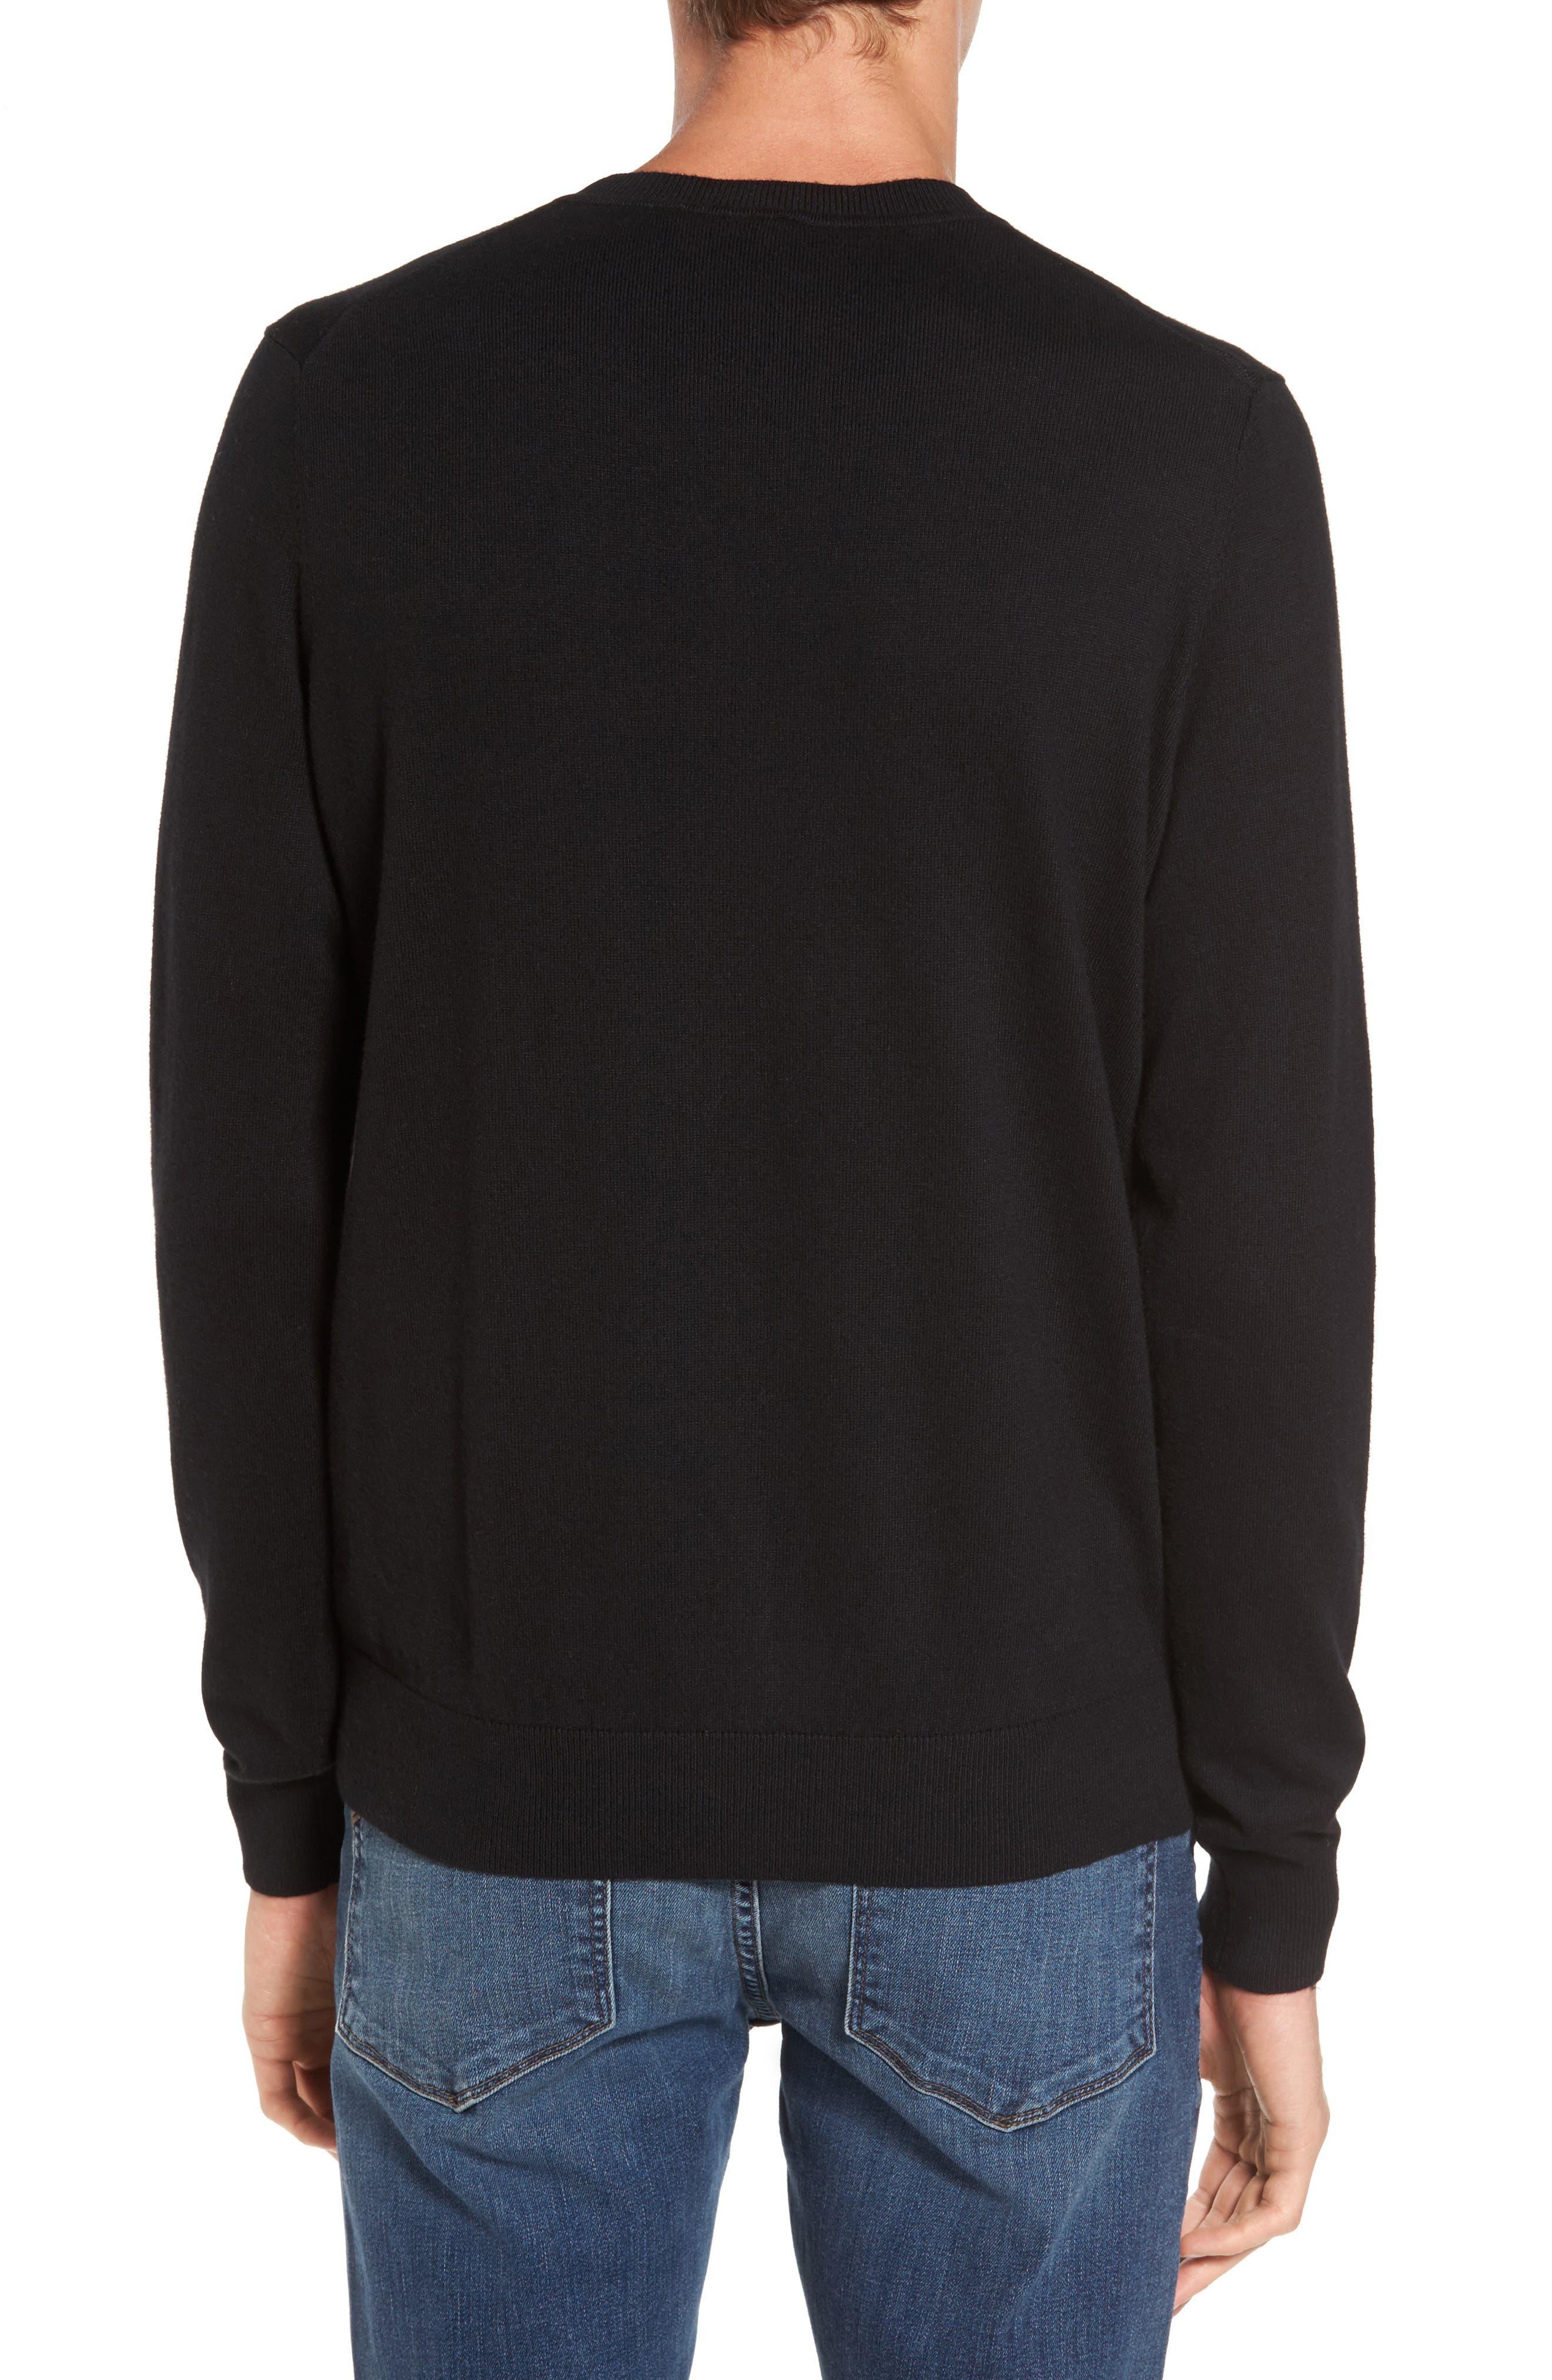 Alternate Image 2  - Lacoste Futurism Graphic Sweater